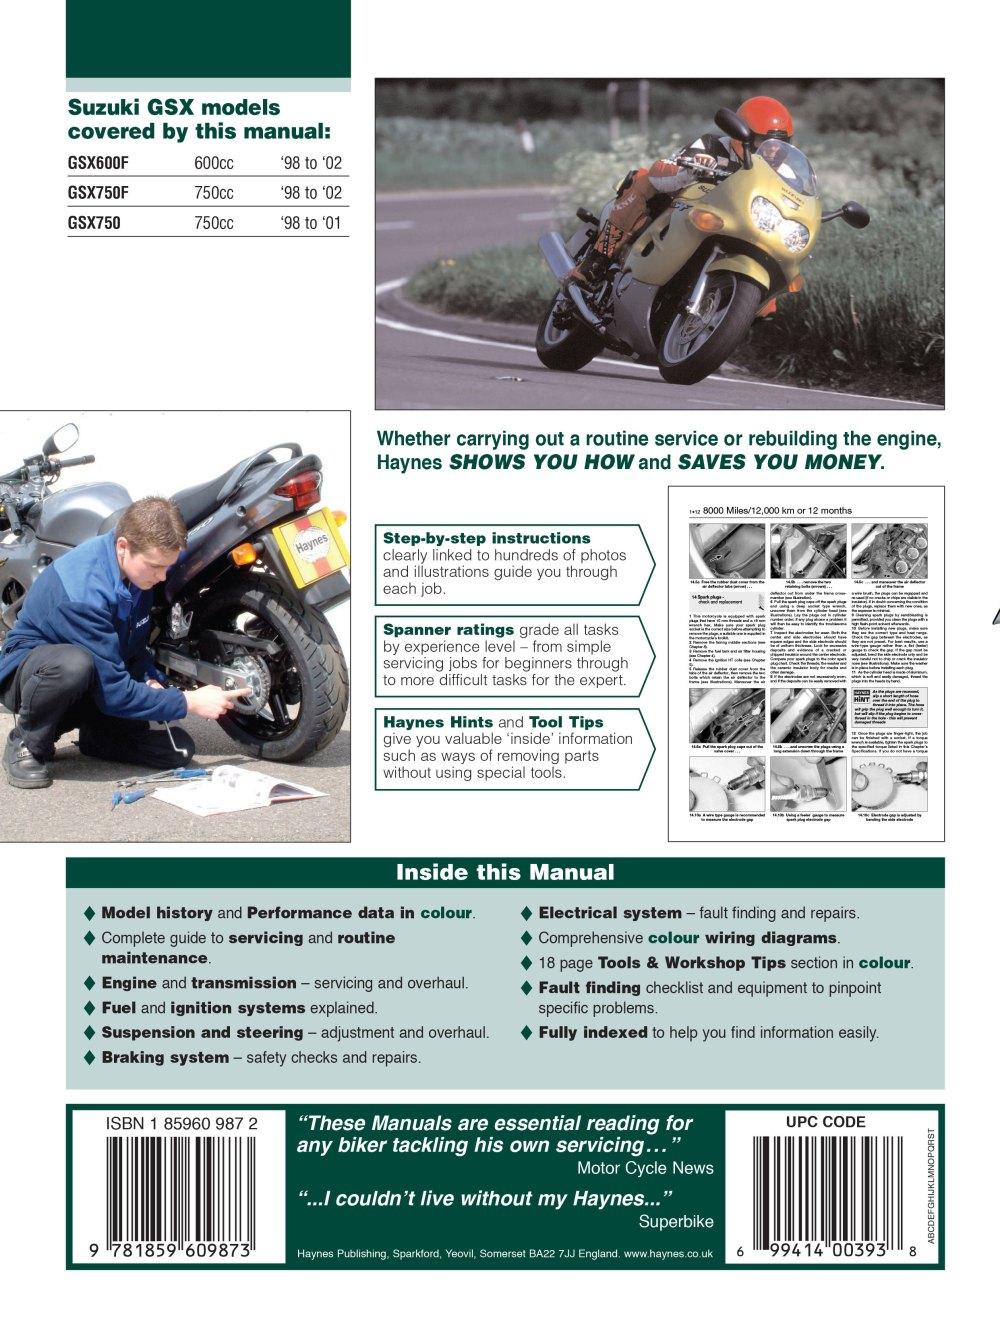 medium resolution of haynes repair manual suzuki gsx600f gsx750f and gsx750 1998 2002 block diagram 2002 gsx600f wiring diagram